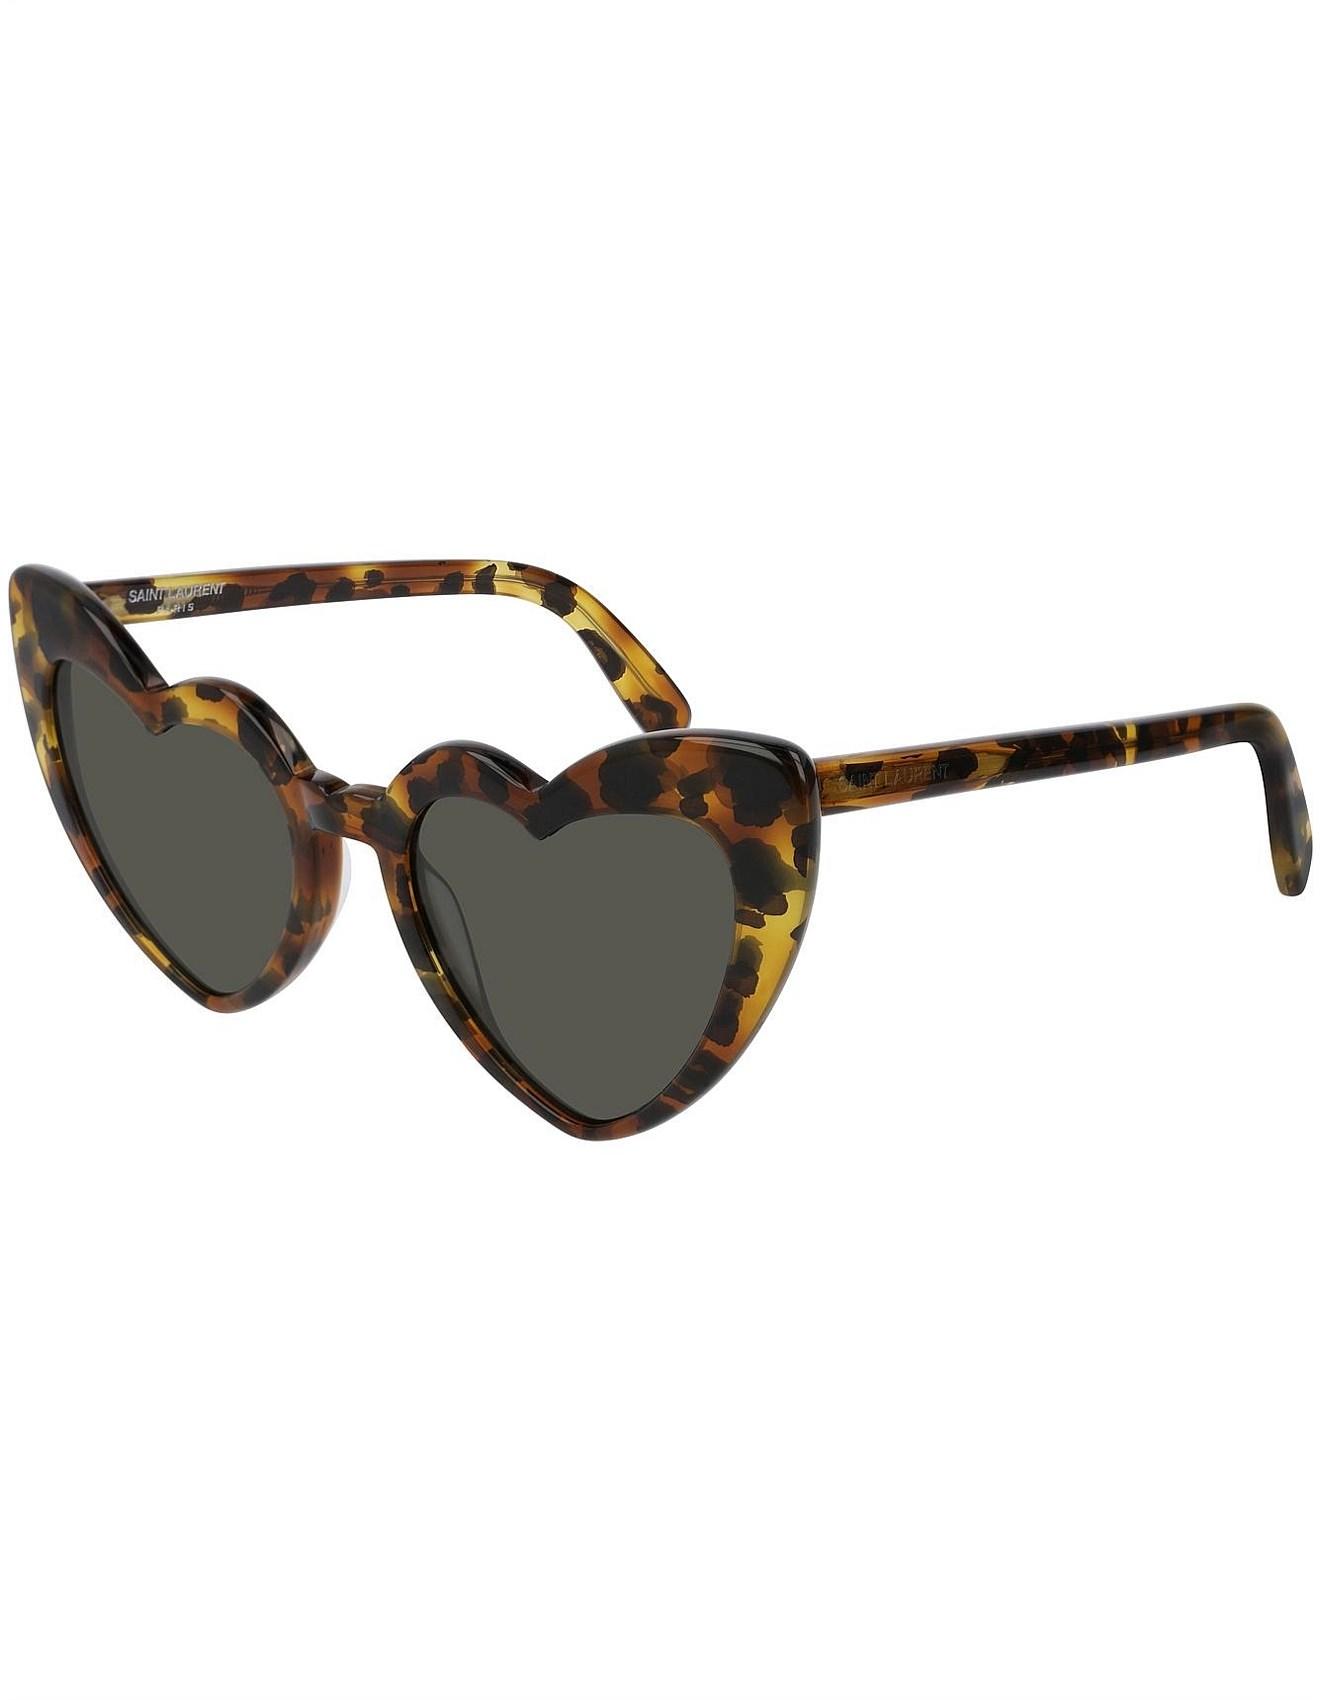 3e2ae9335 Shop Designer Handbags & Bags Online   David Jones - Saint Laurent  Sunglasses